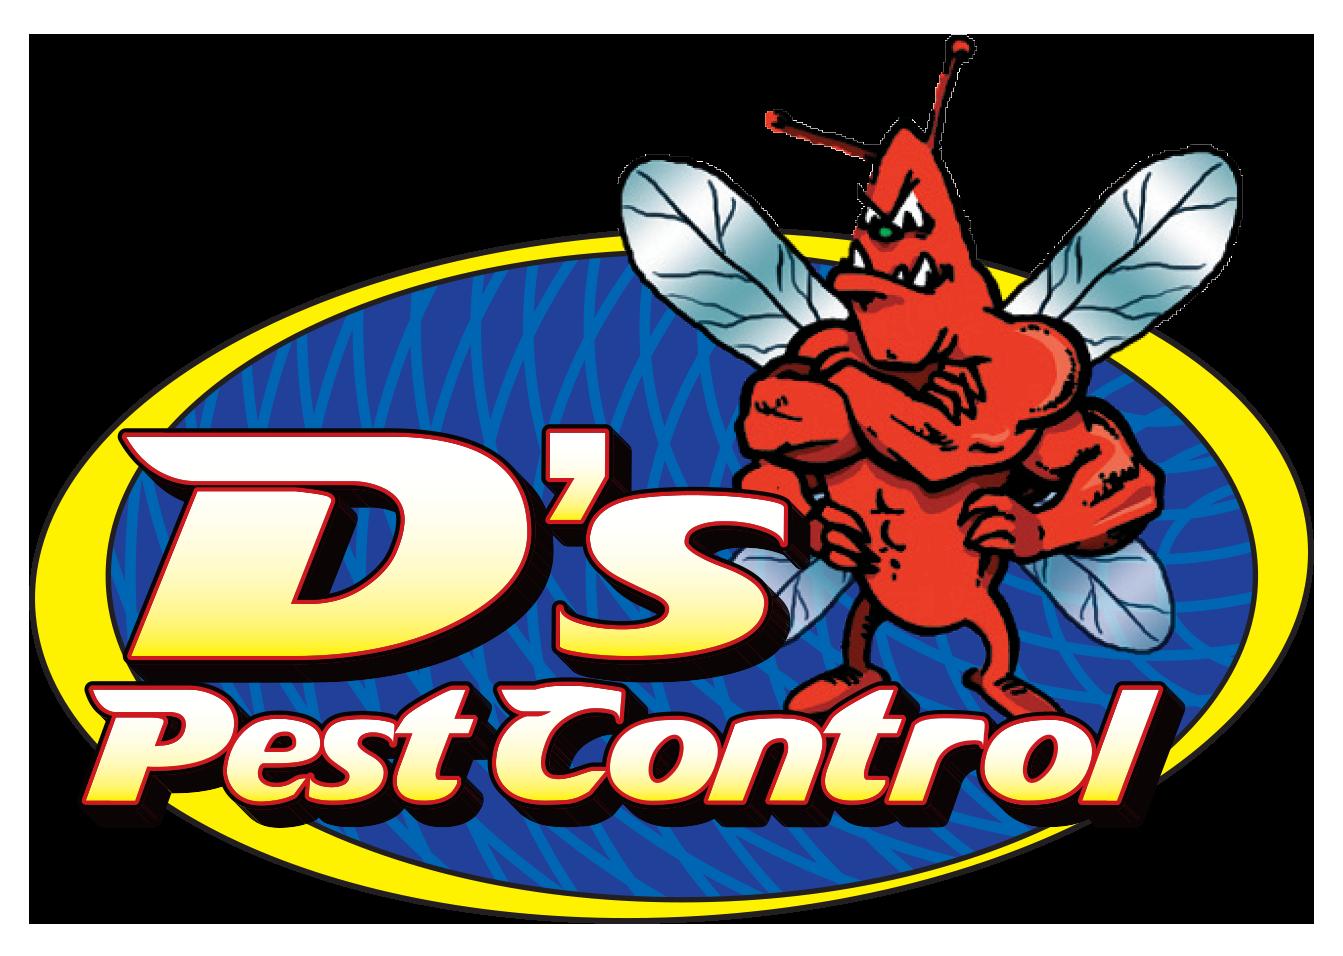 D's Pest Control logo